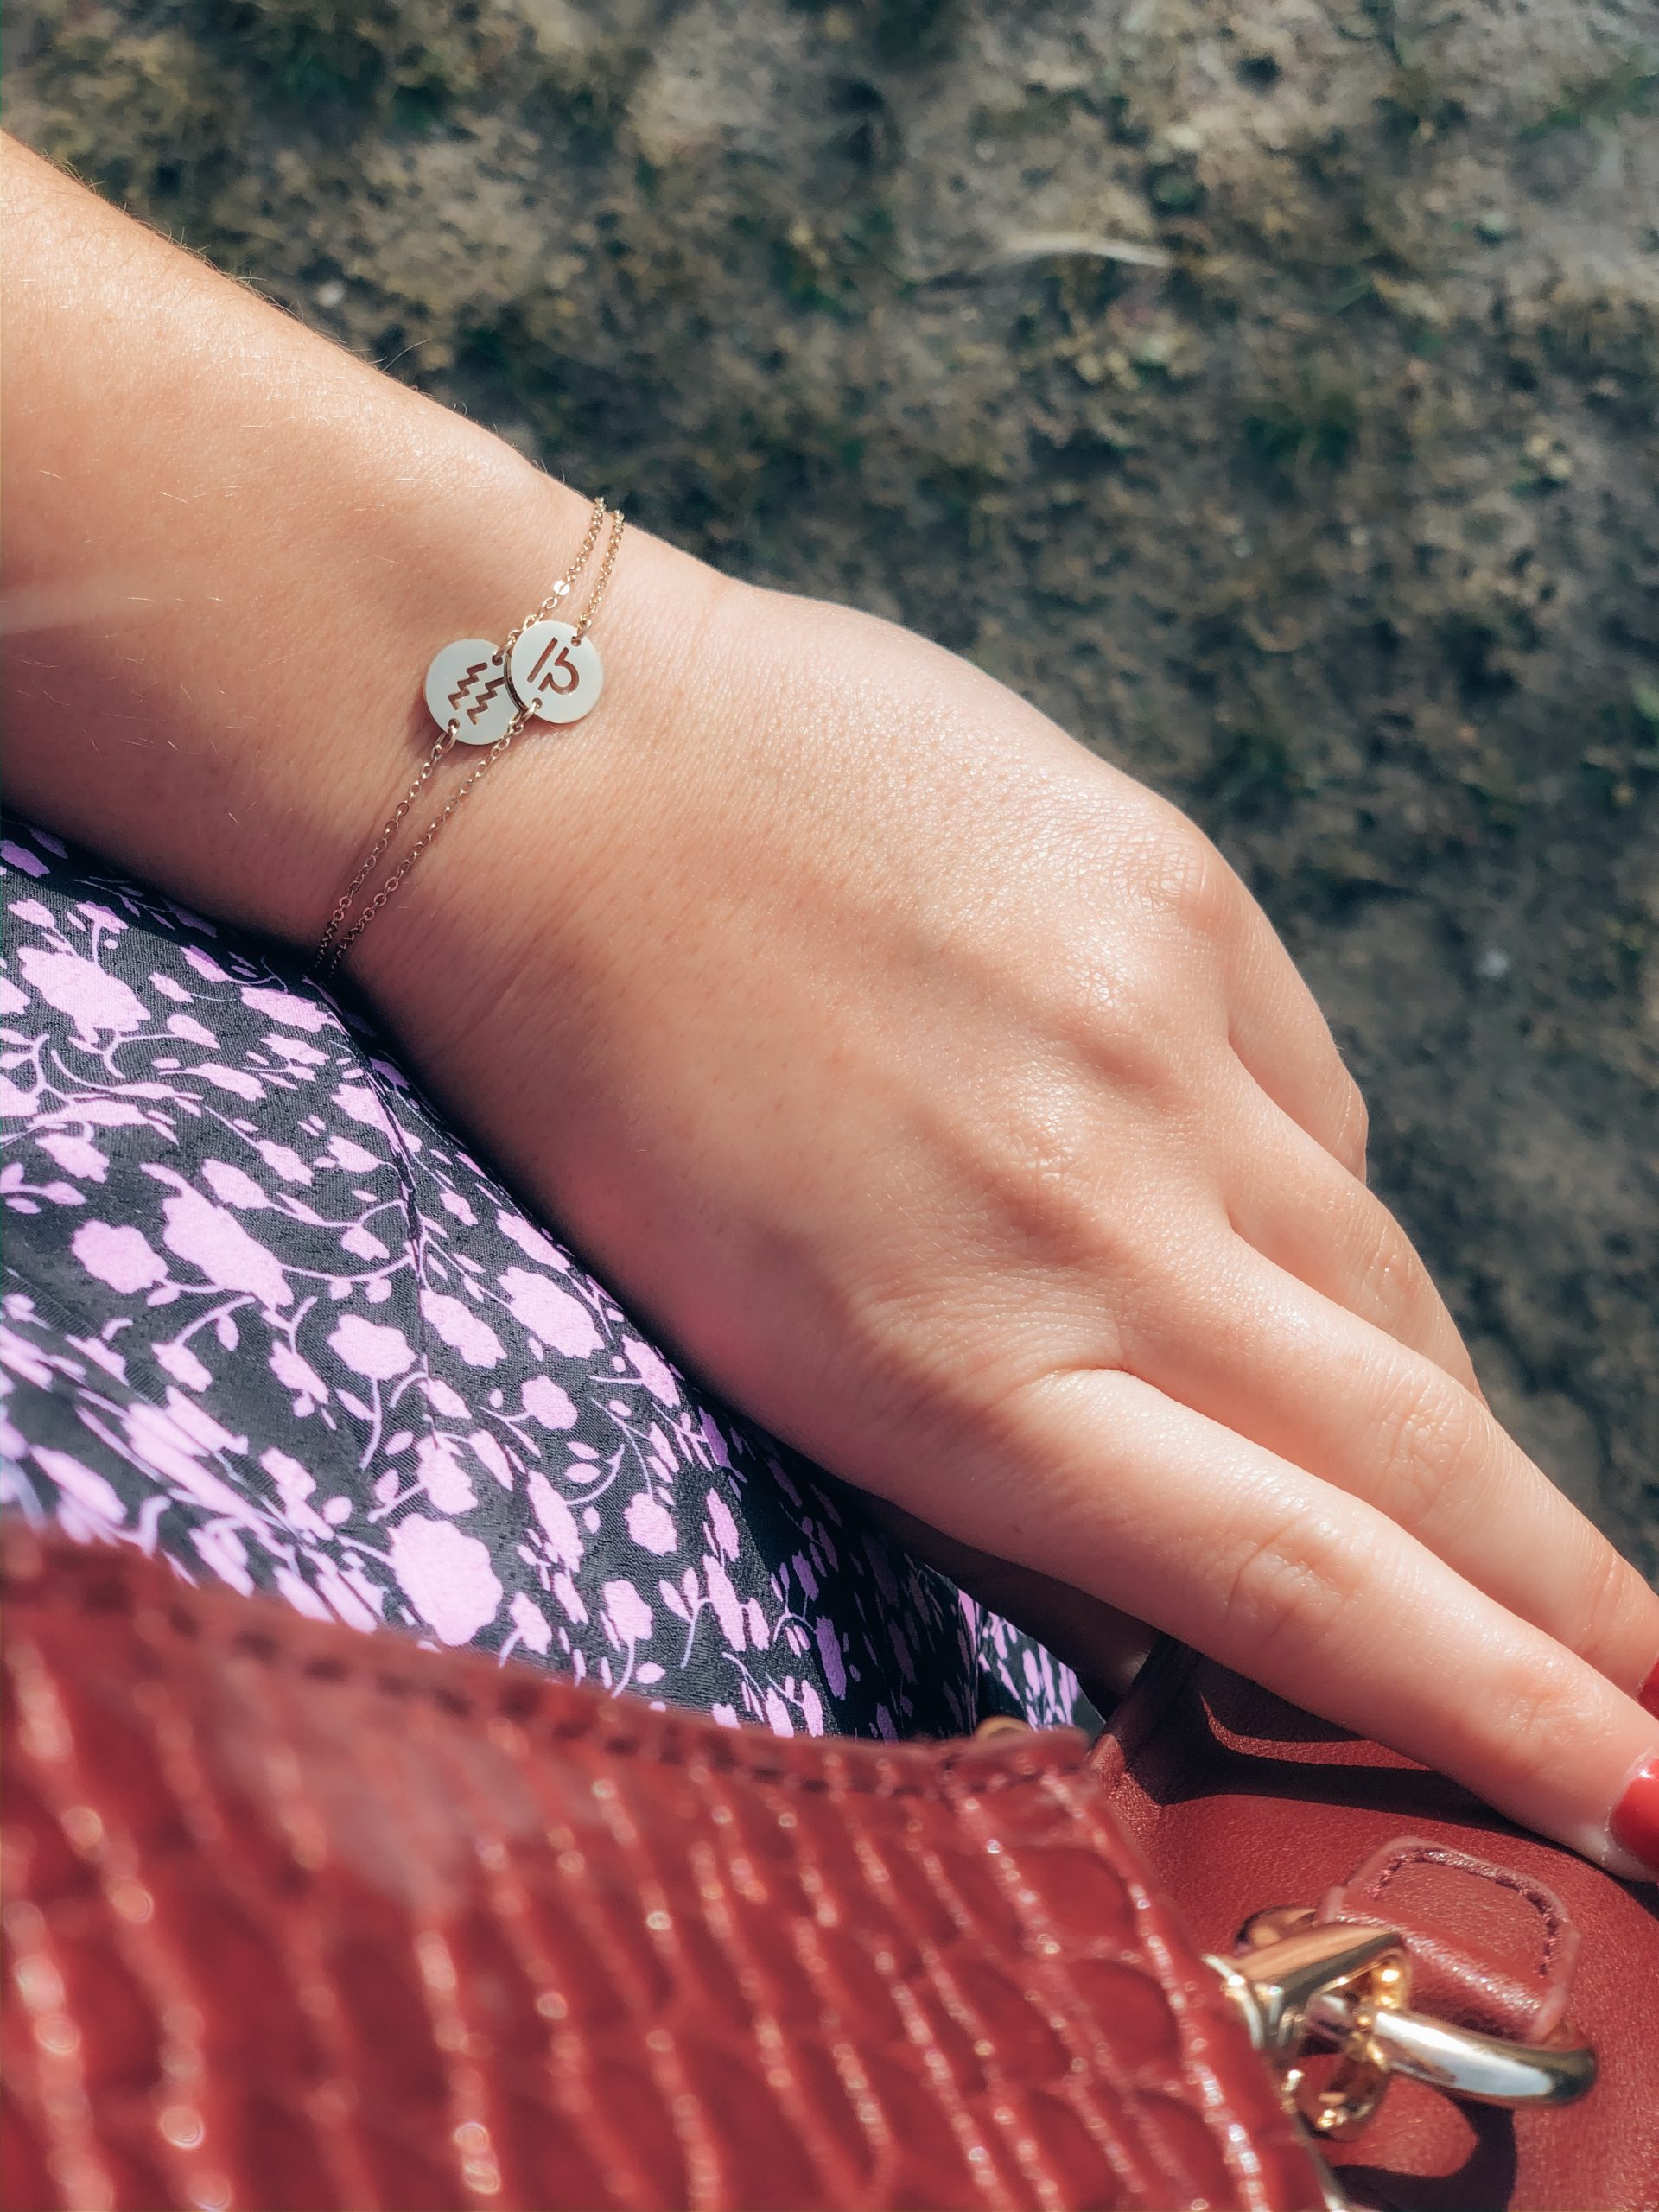 my jewellery, sieraden, tasje, armbandjes, gepersonaliseerd, armband, xmariekie